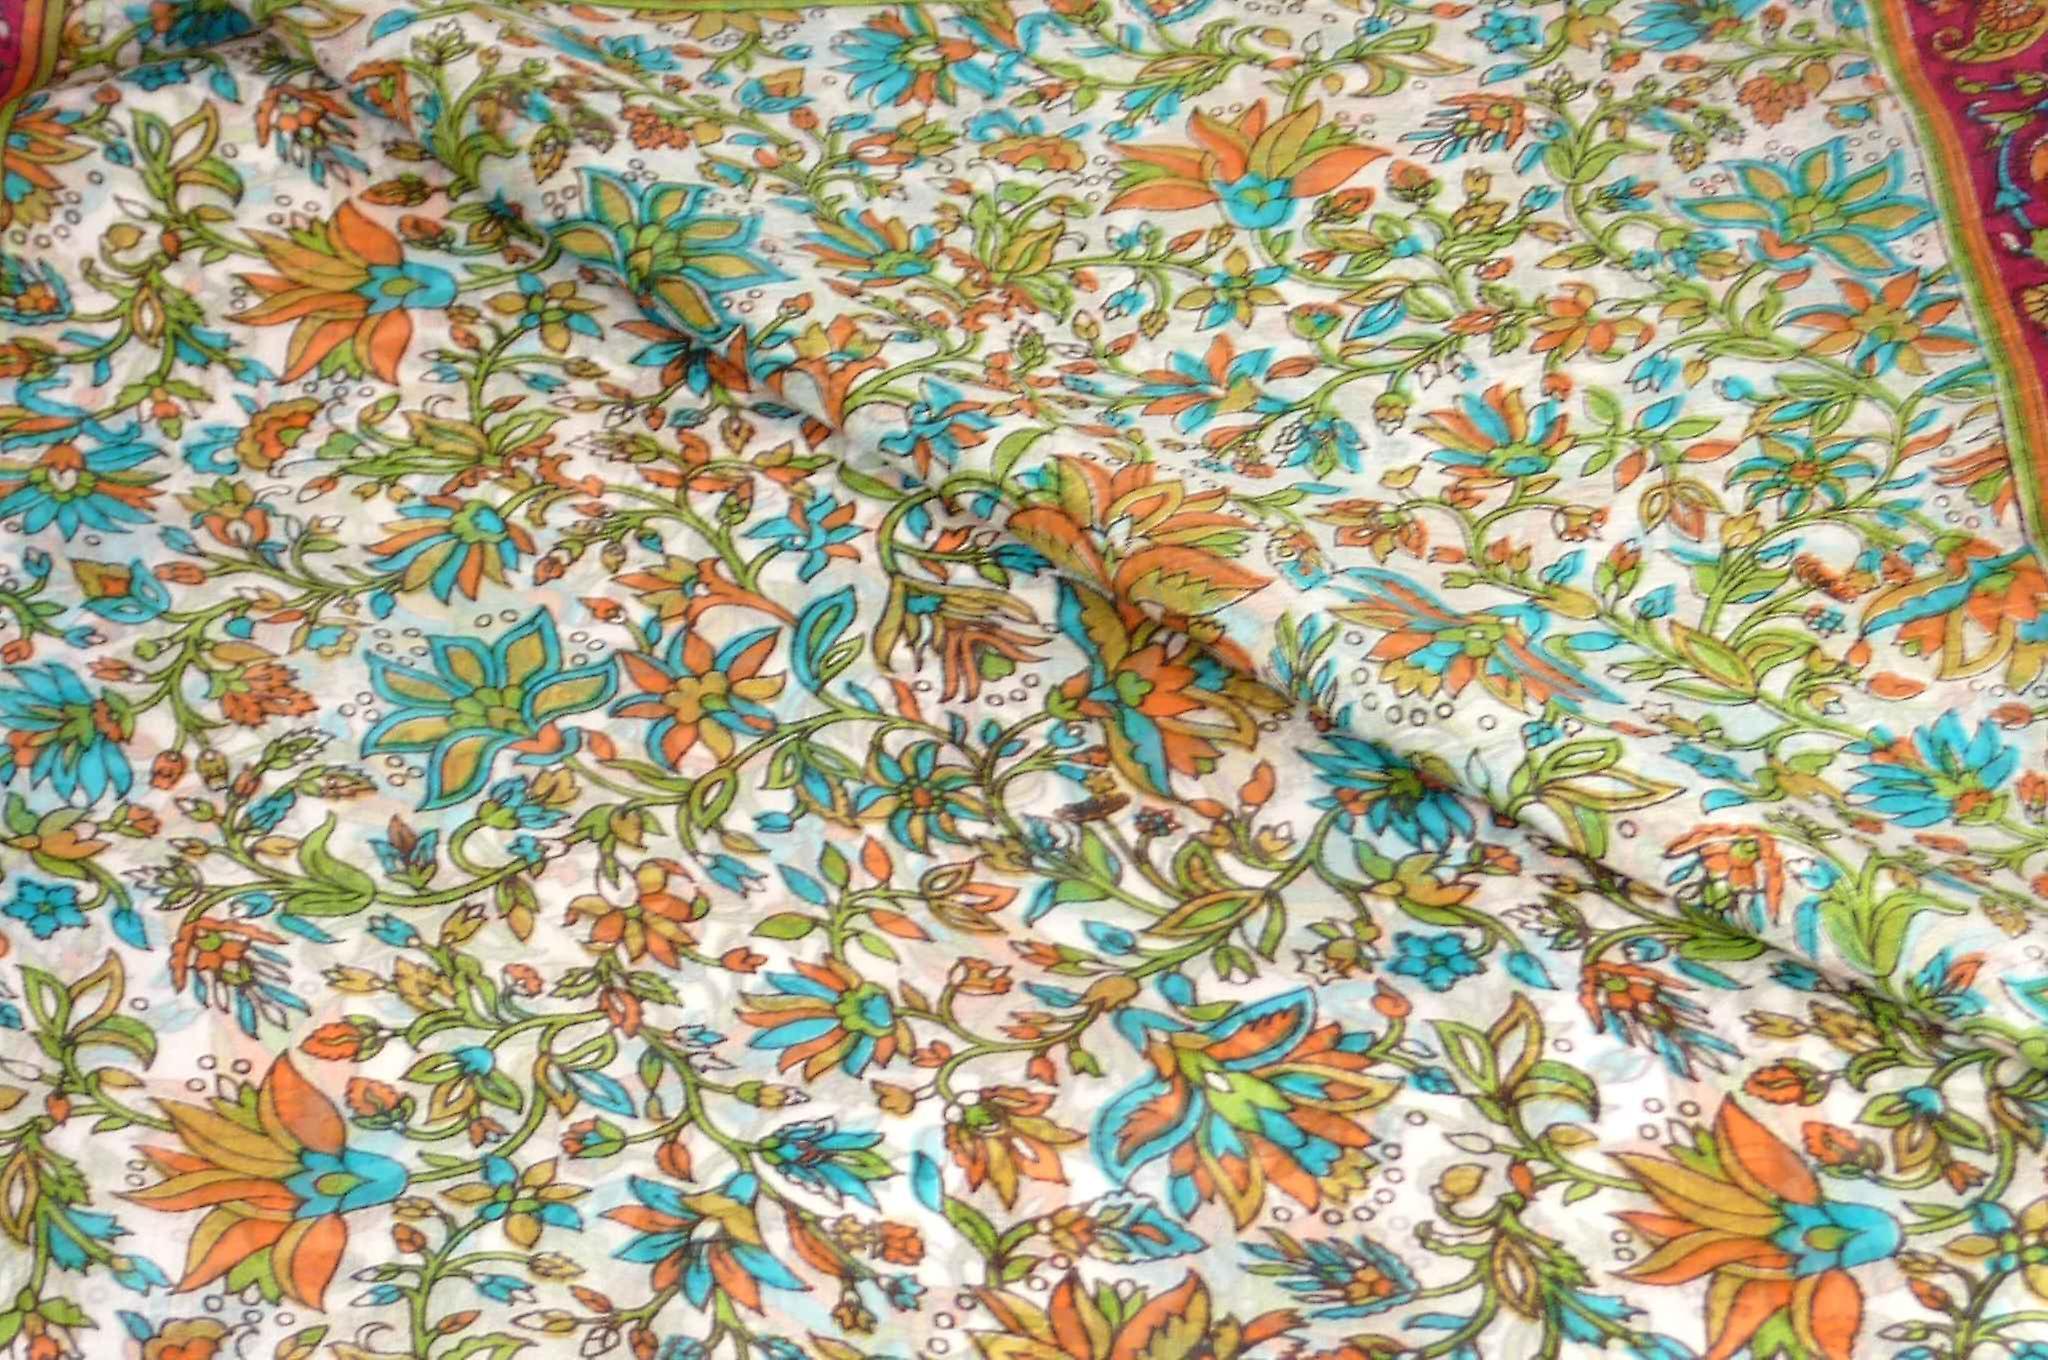 Mulberry Silk Traditional Long Scarf Sarita Cerise by Pashmina & Silk